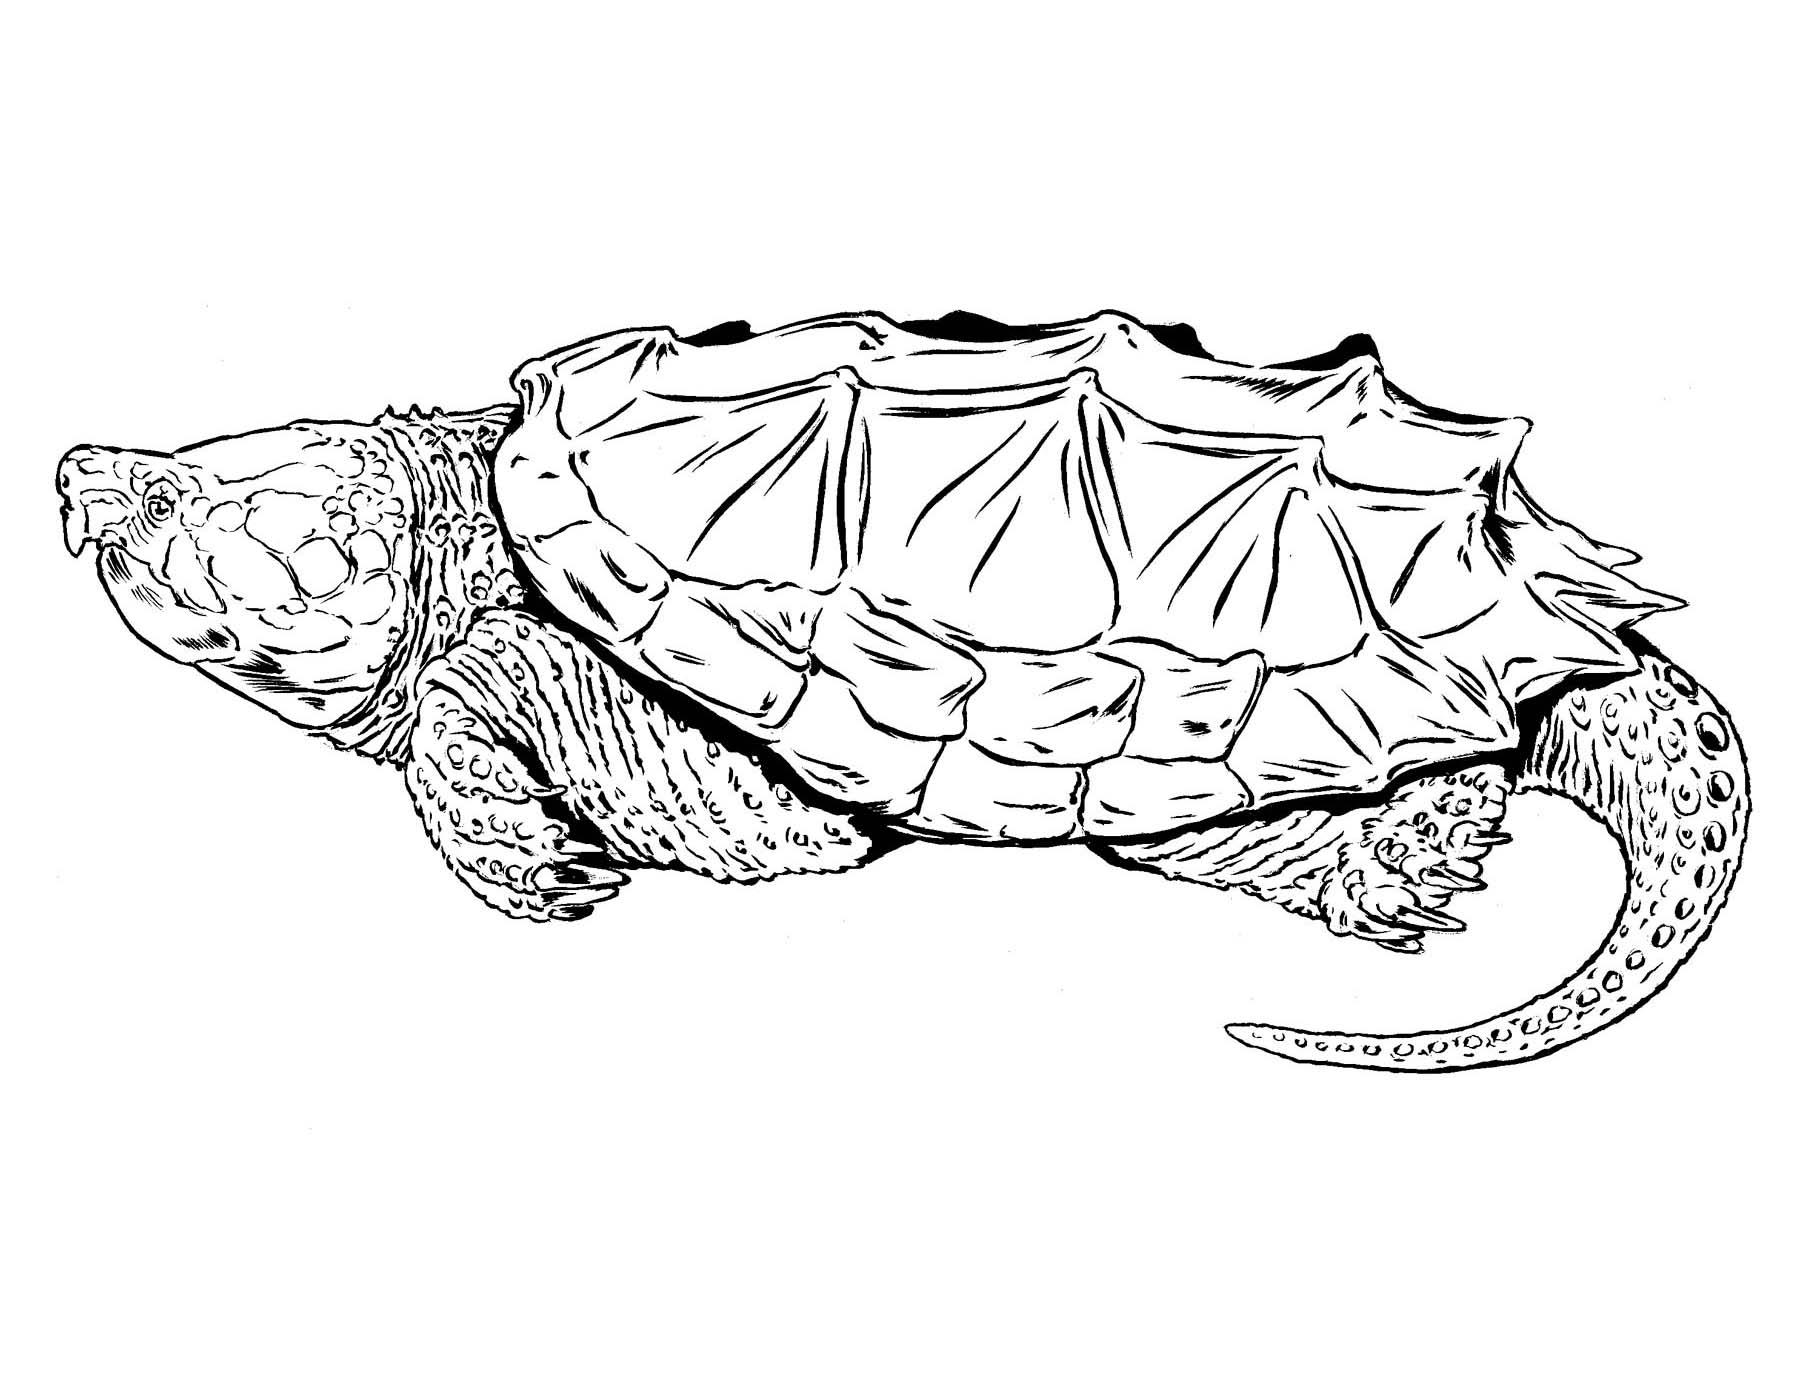 1800x1400 Alligator Drawing For Kid Big Pencil Tutorial Color Iydunetwork